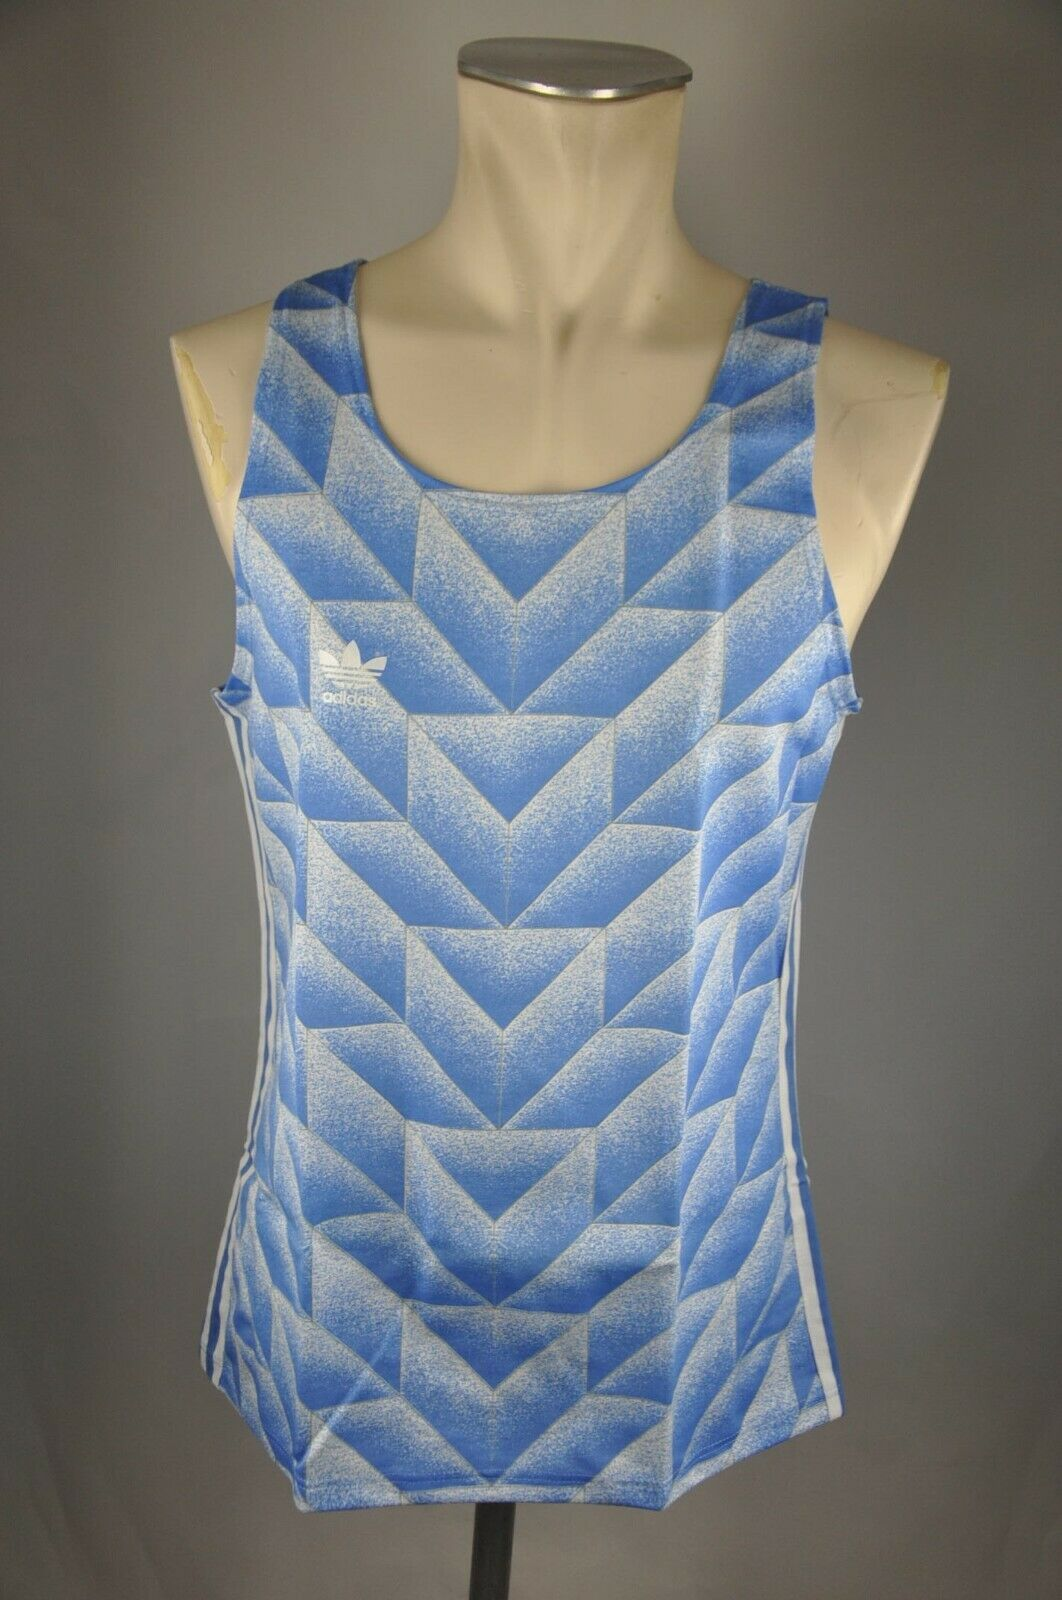 Adidas vintage Achselshirt 80er oldschool Shirt blau Gr. 3 XXS Singet 80s VAD1